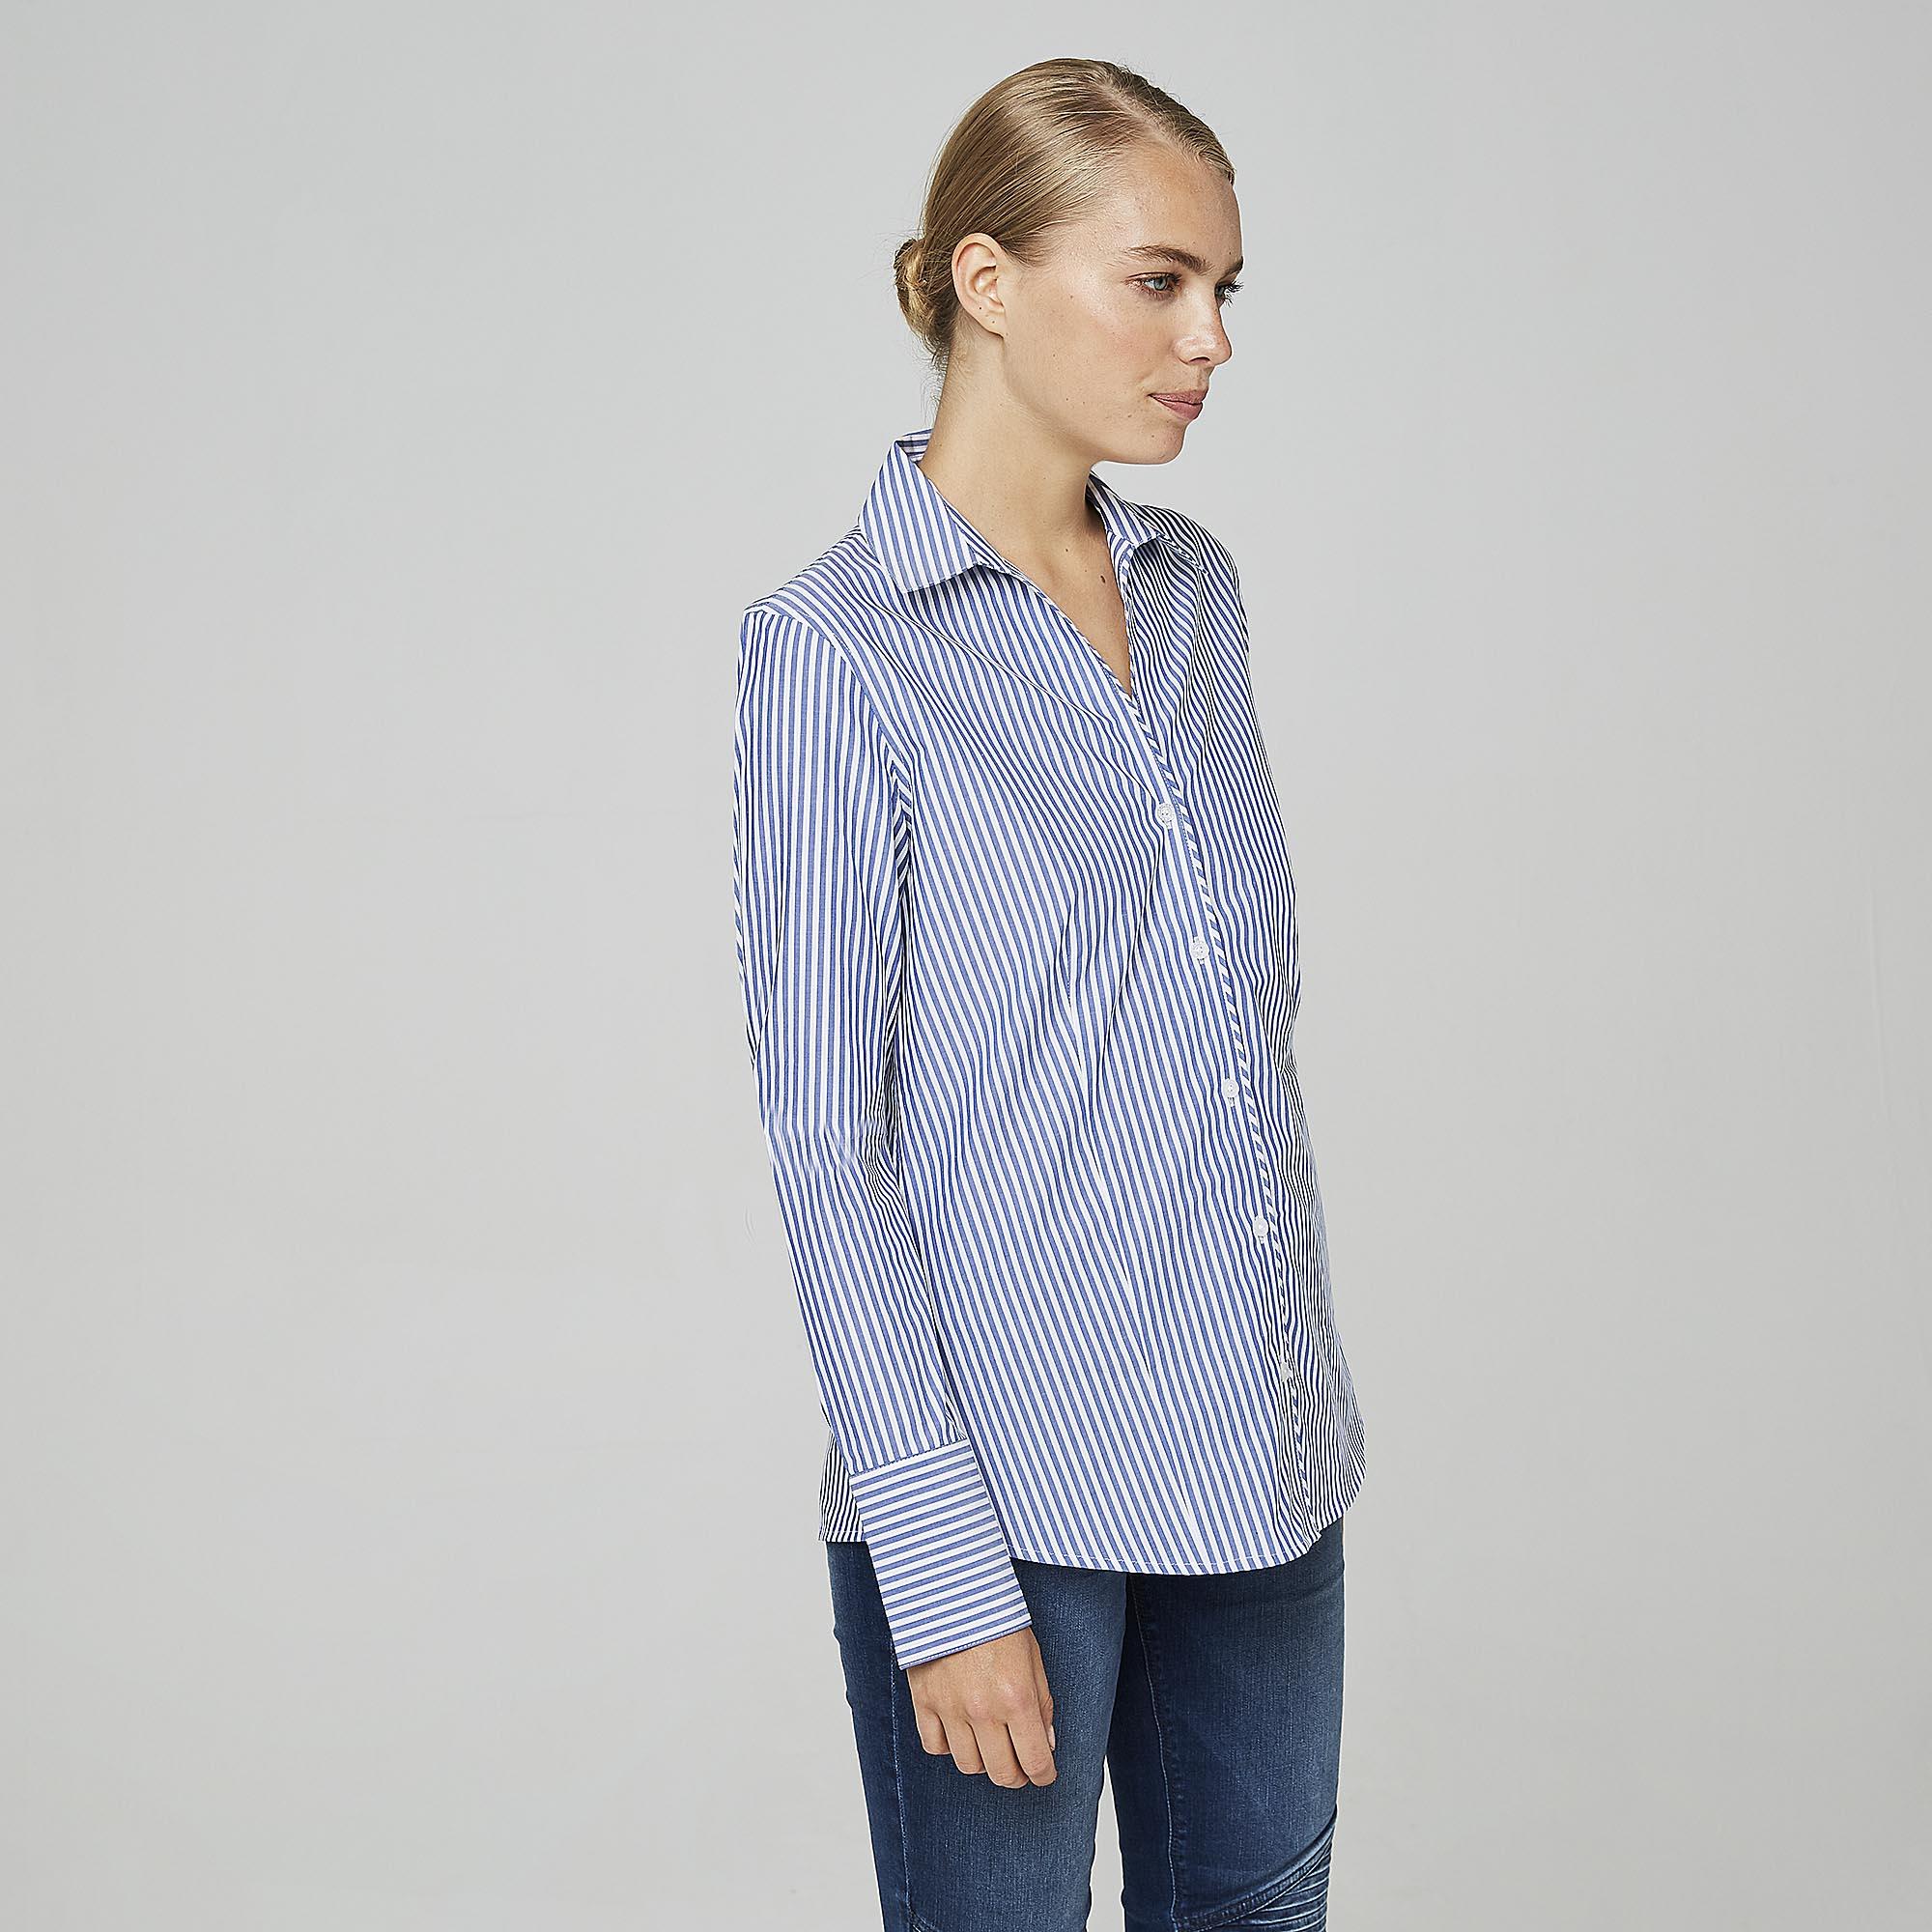 KLP Classic Shirt